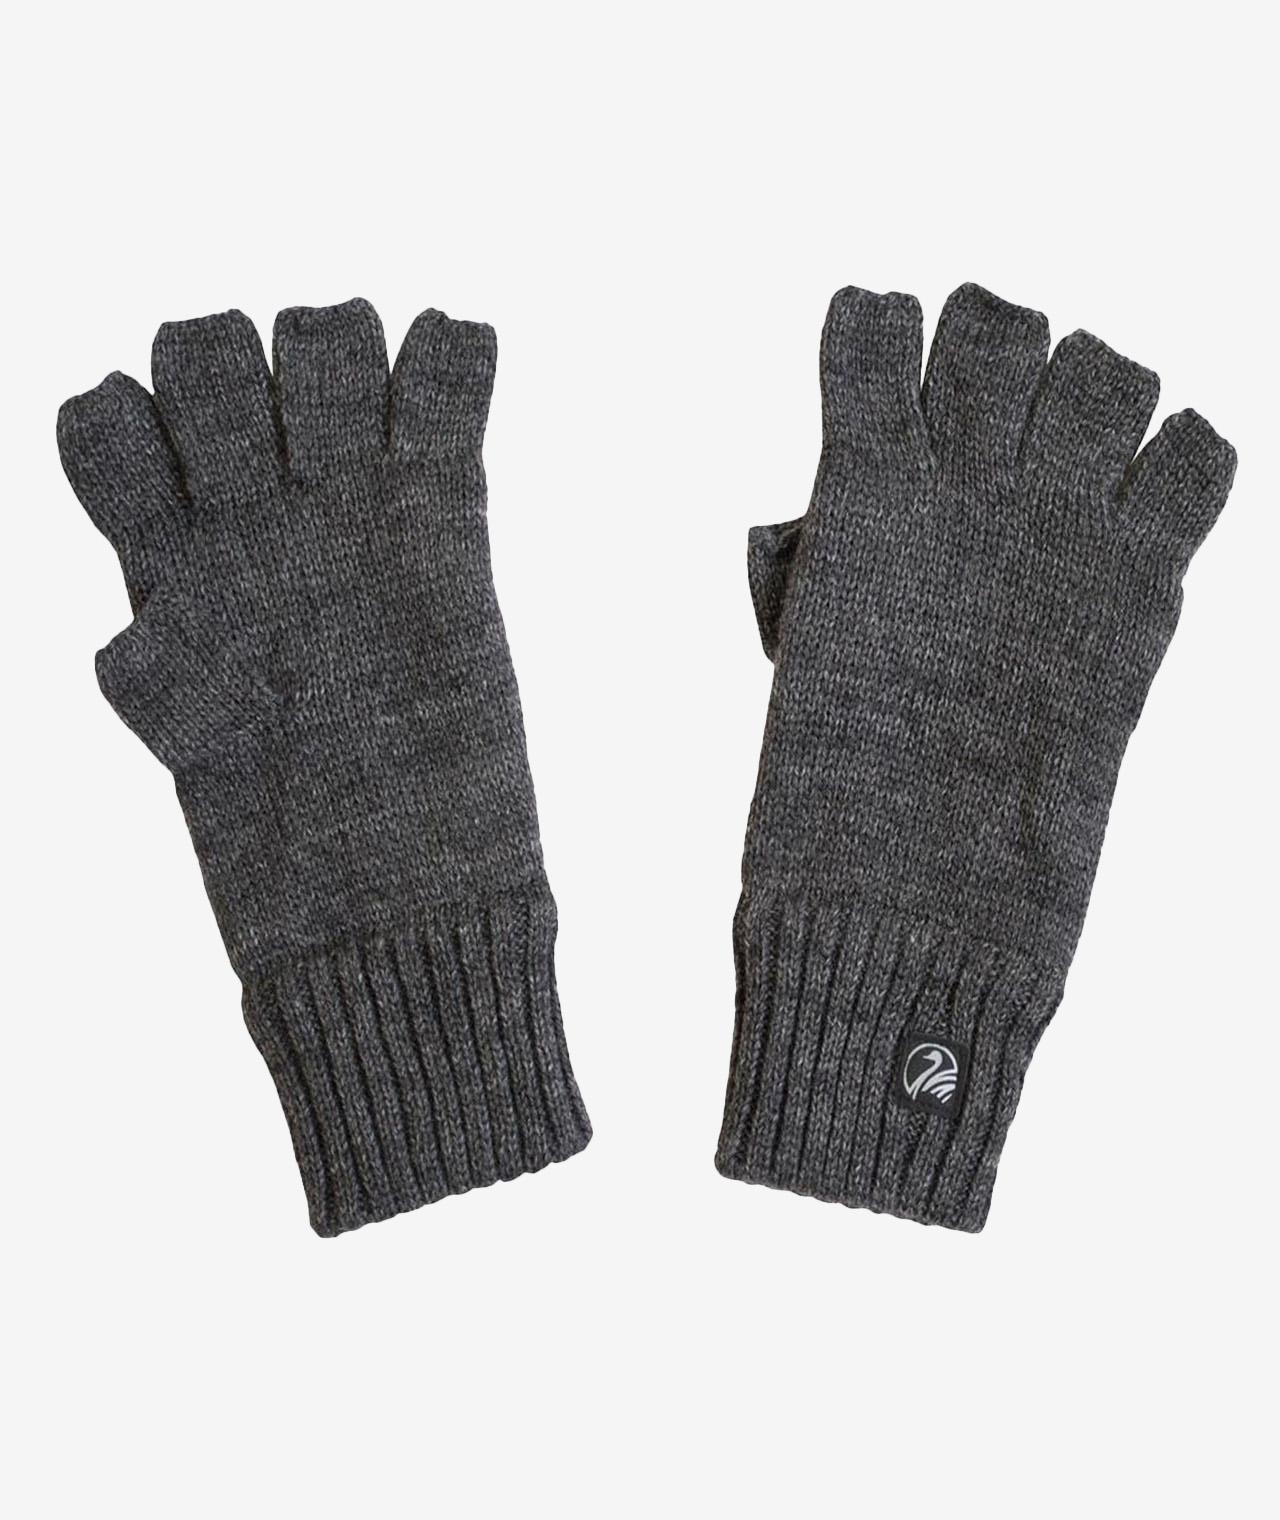 Swanndri Fingerless Wool Glove with Fleece Lining in Charcoal Marle